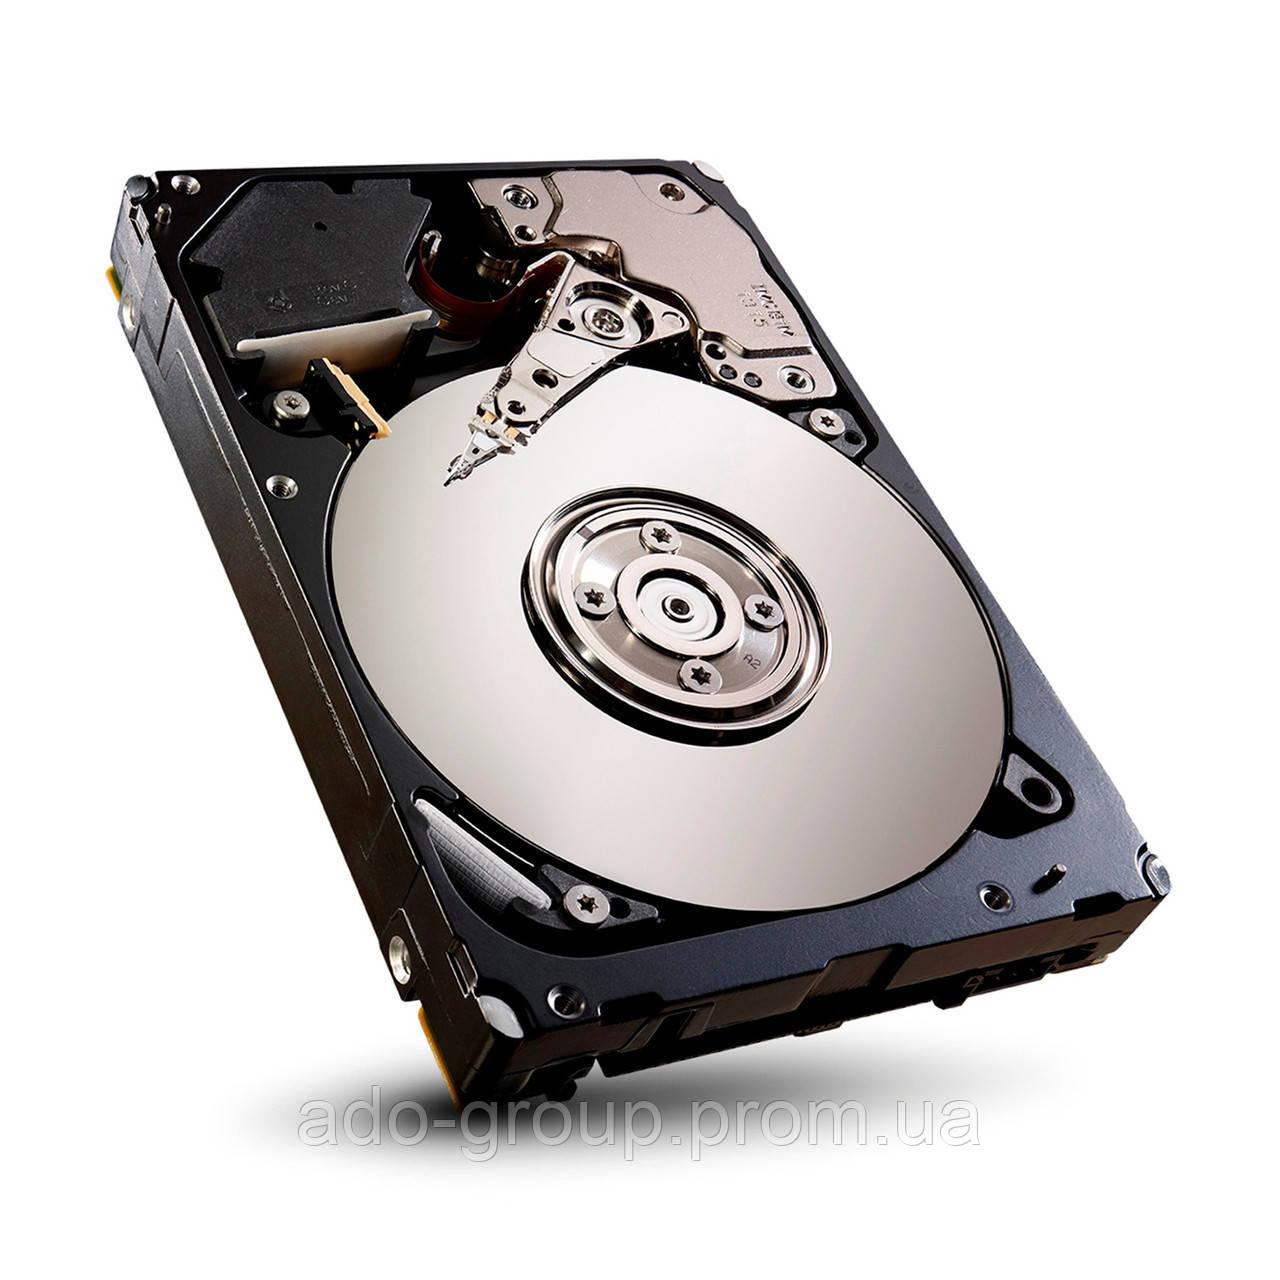 "375863-016 Жесткий диск HP 300GB SAS 10K  2.5"" +"